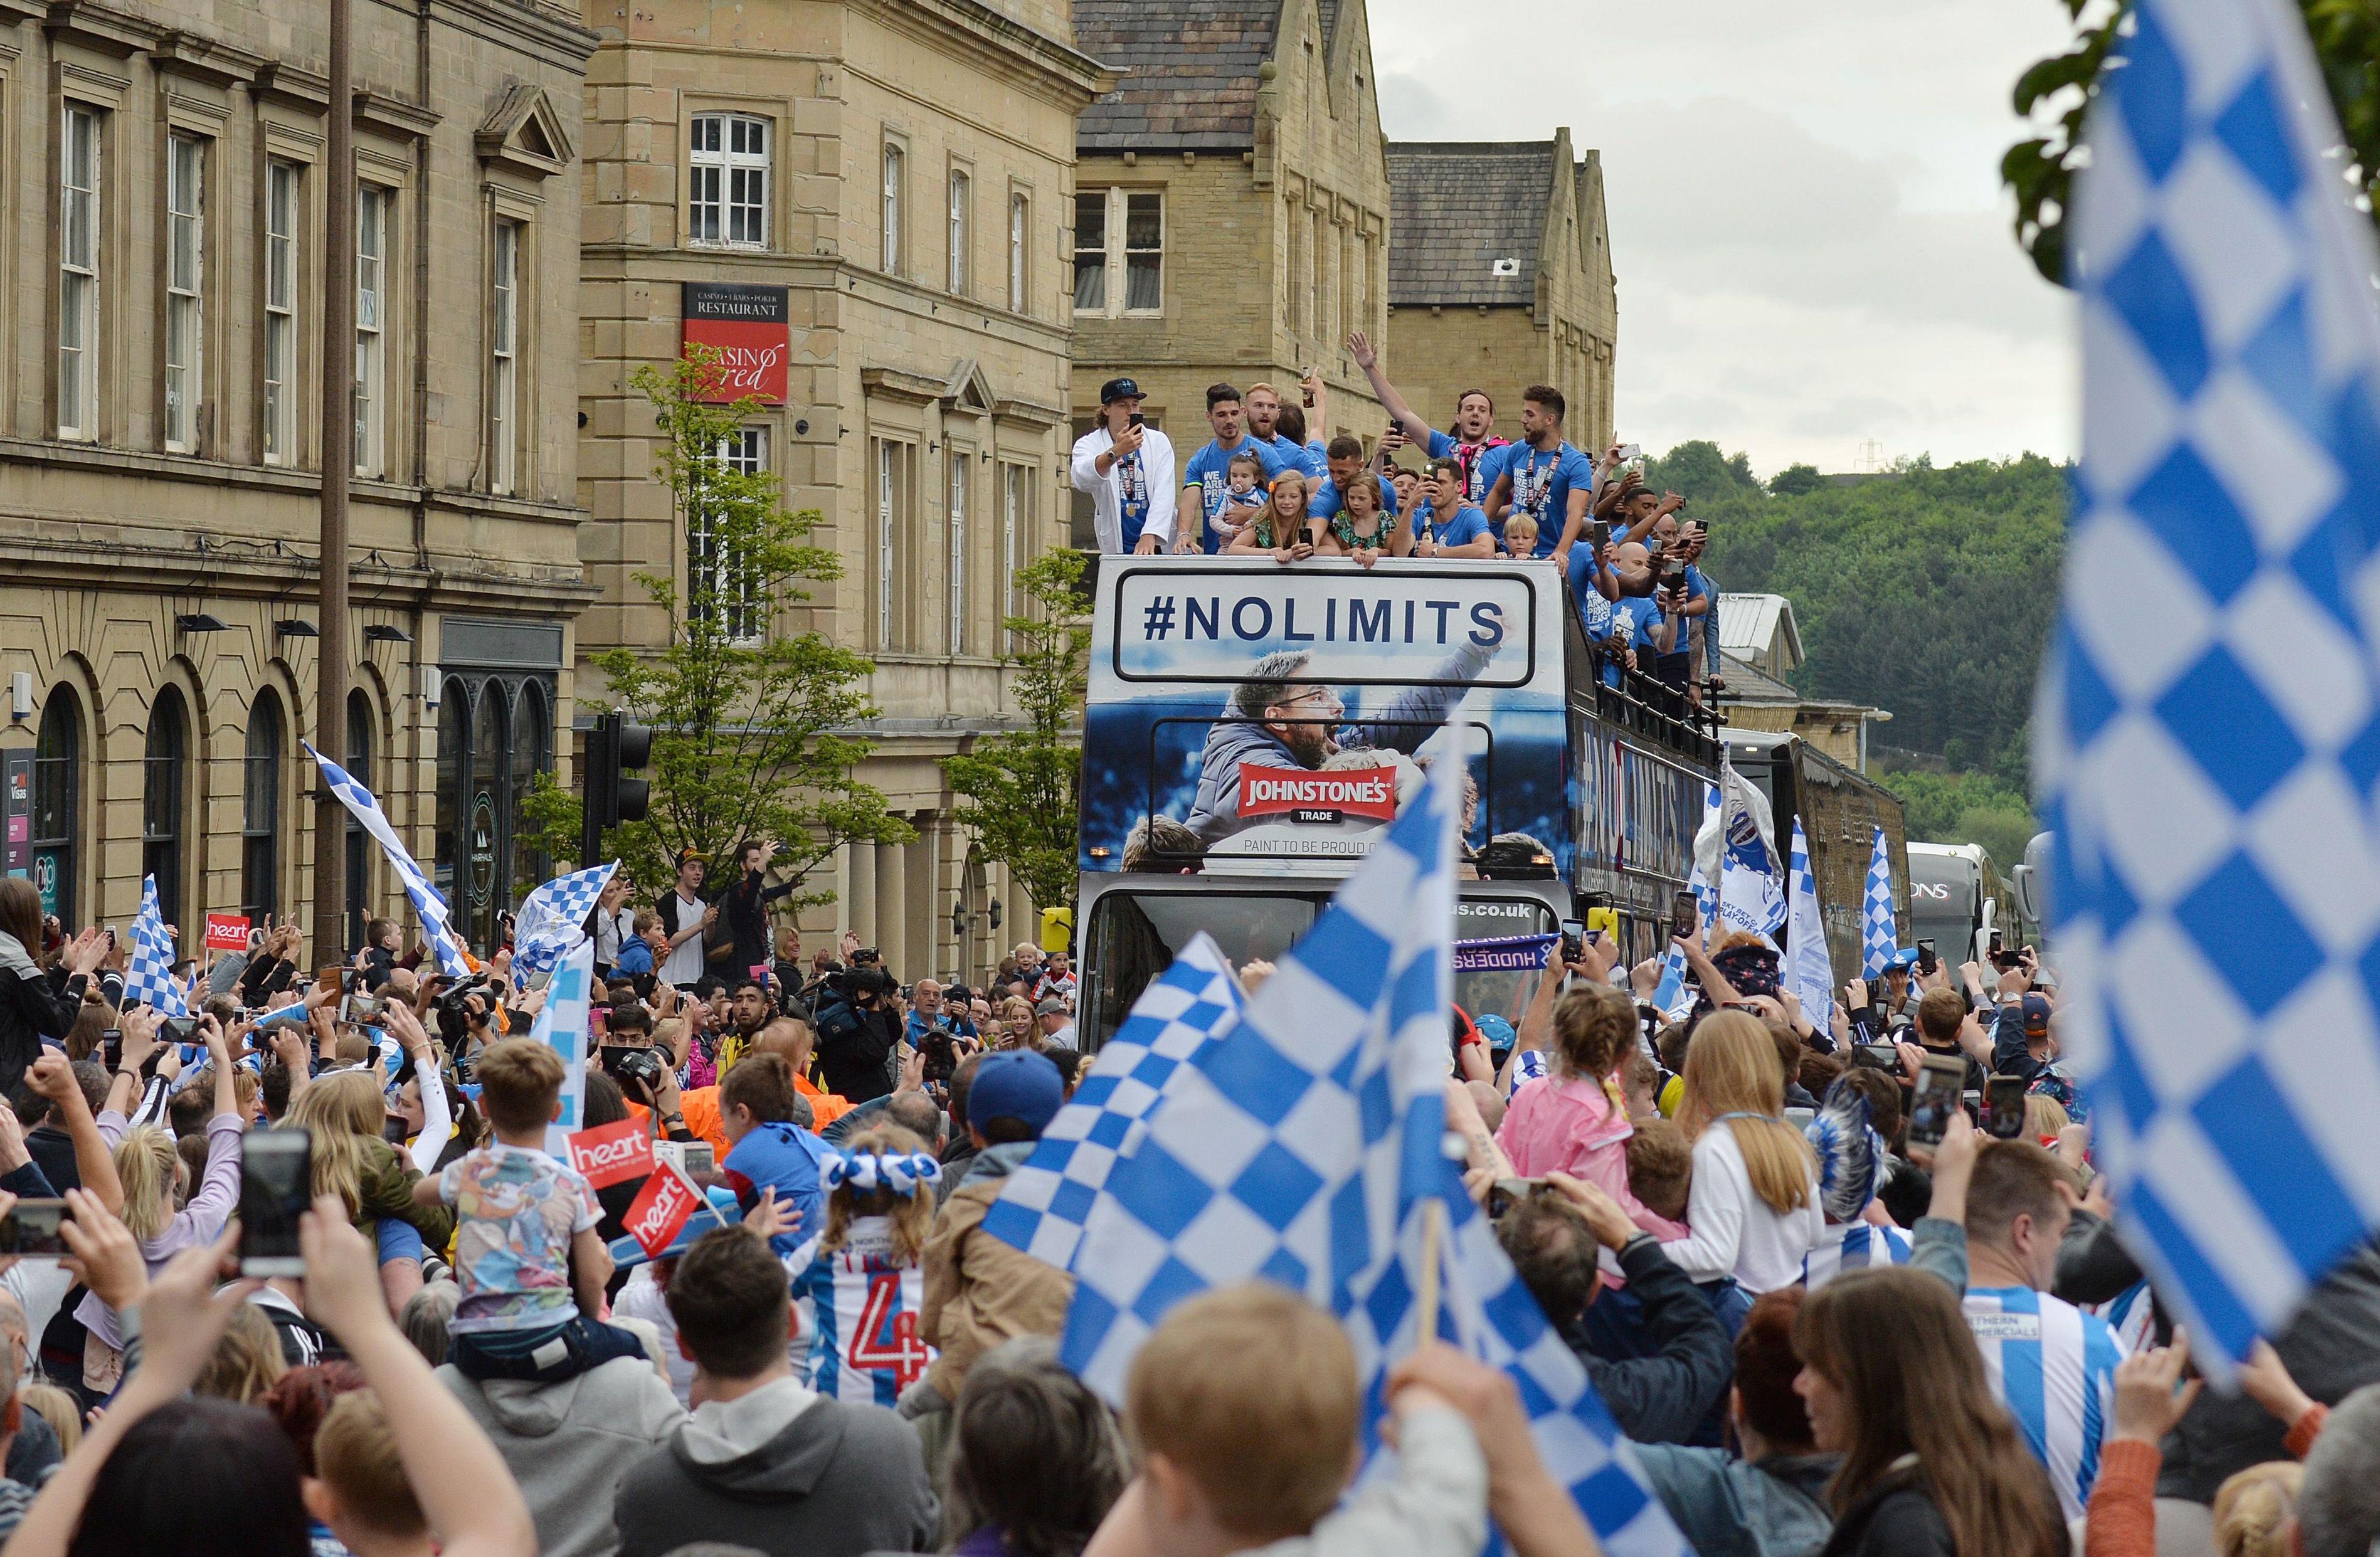 New Boys - Huddersfield Town